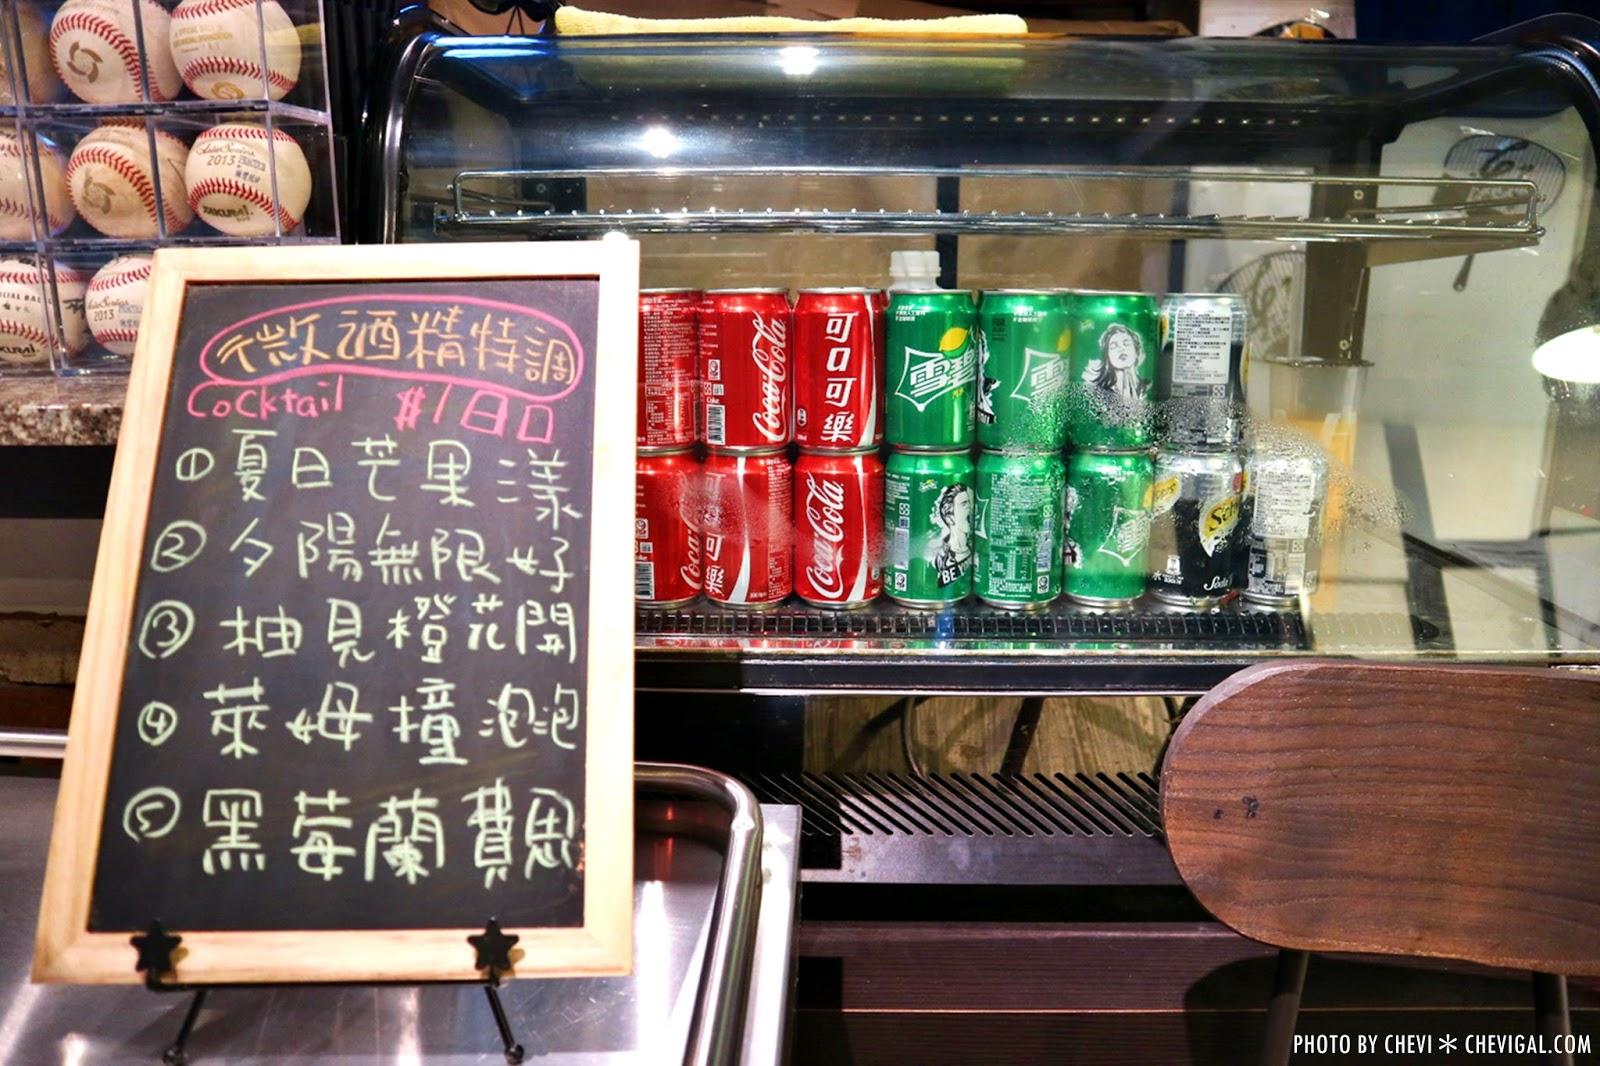 image256 - 熱血採訪│大和17。日式建築的運動主題餐館。自在氣氛包場好地方。臺虎精釀也能喝得到 (已歇業)